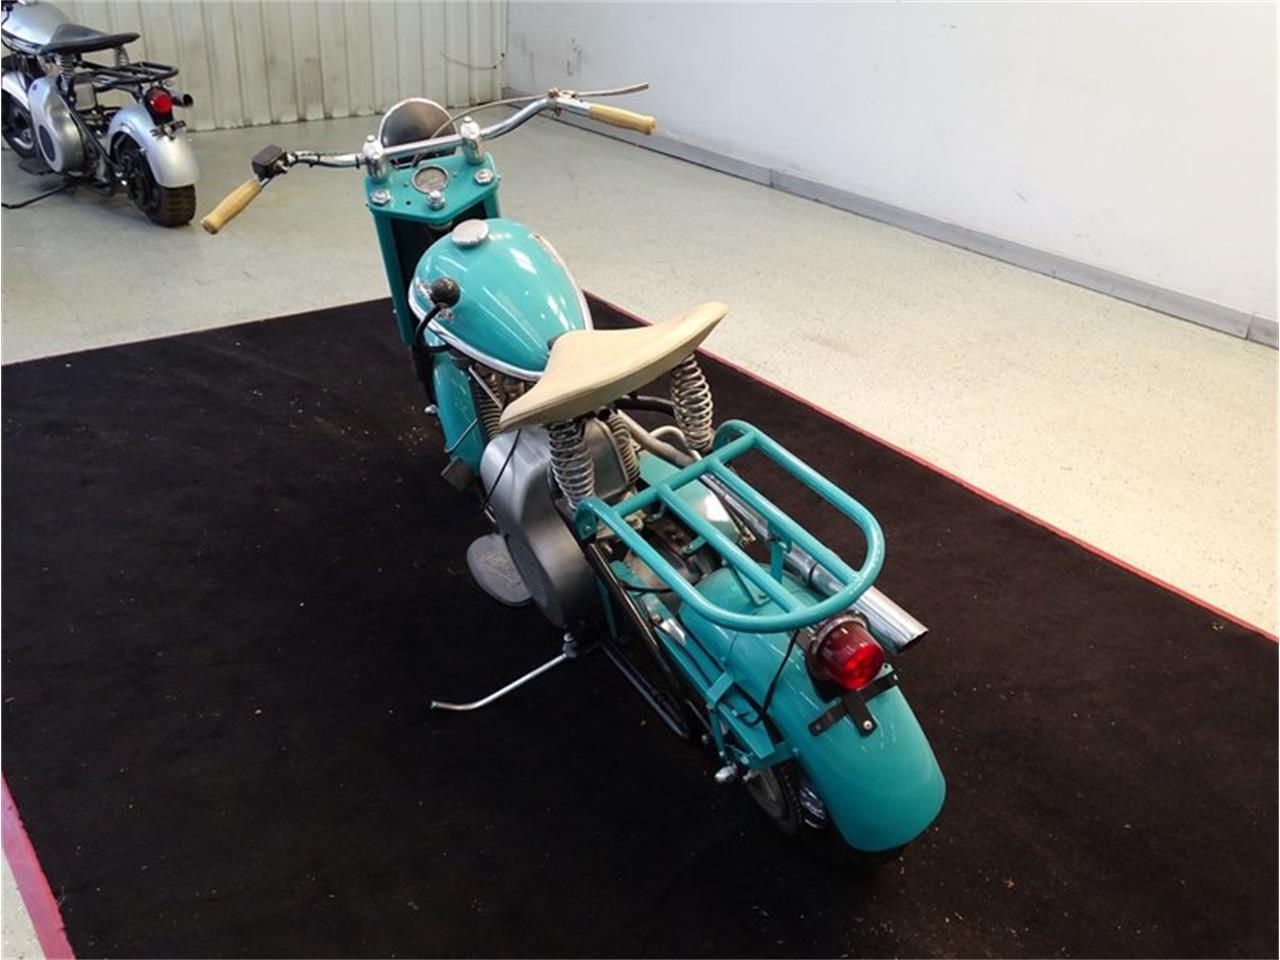 1956 Cushman Motorcycle (CC-1388971) for sale in Greensboro, North Carolina